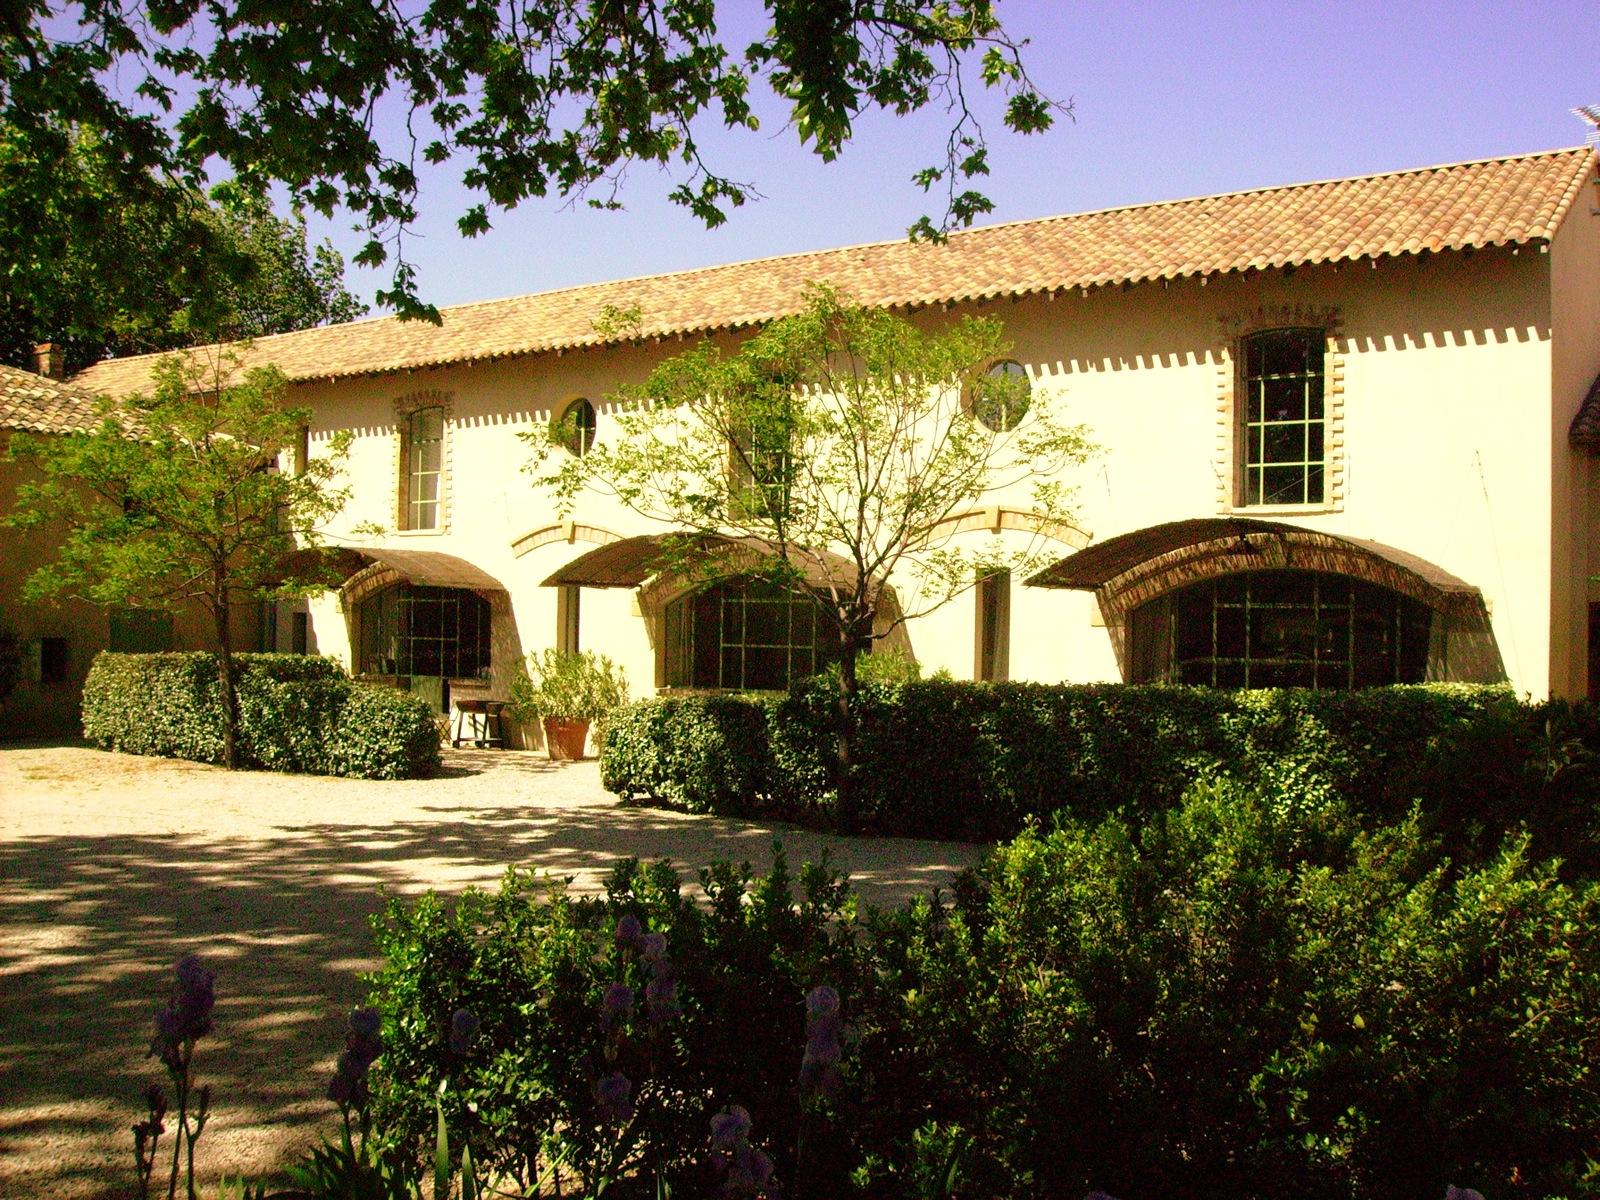 A Provencale Villa and Vineyard